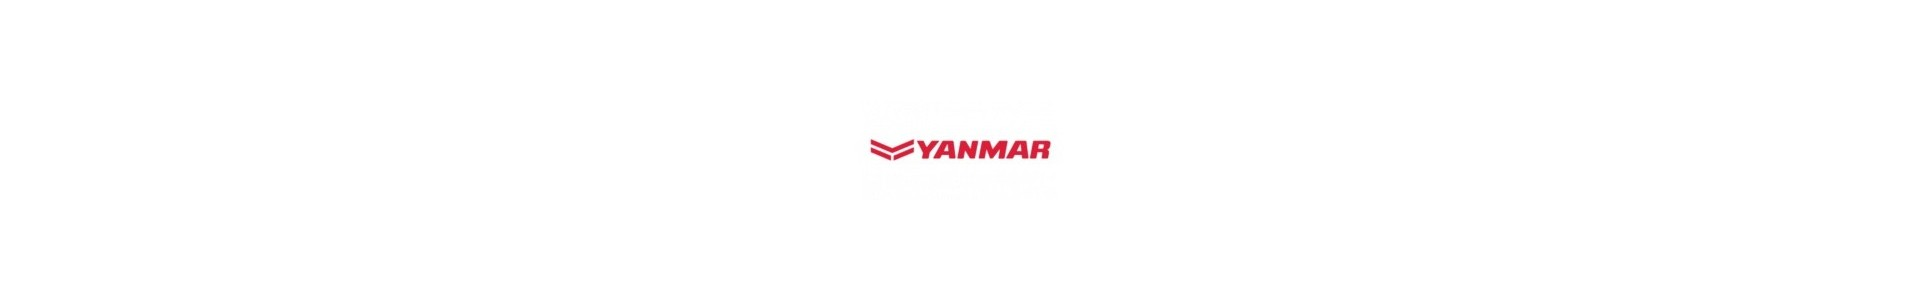 Injecteurs Yanmar